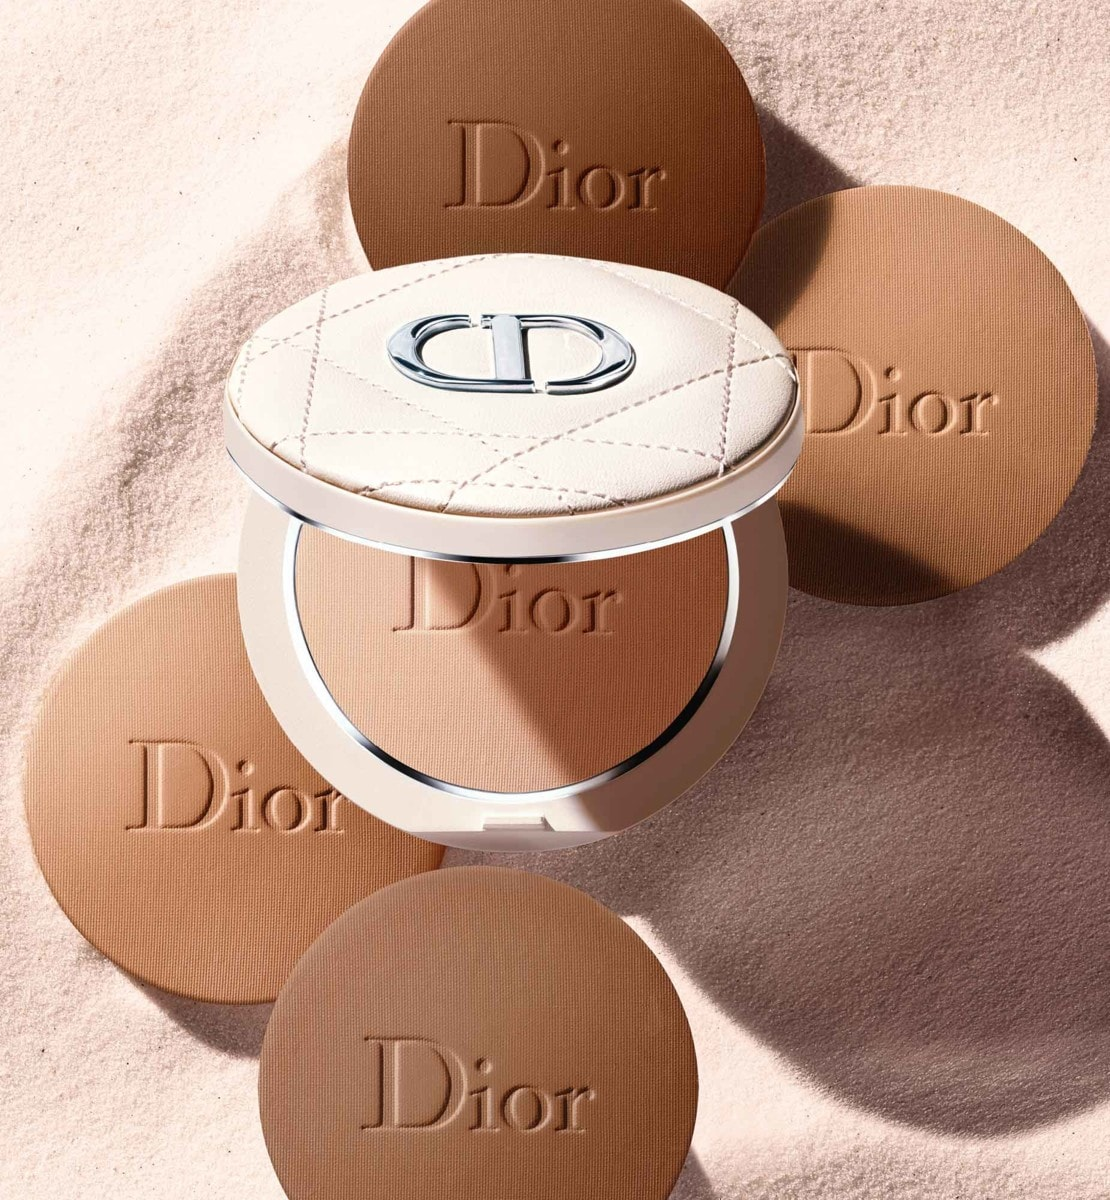 Dior - Dior Forever Natural Bronze Poudre bronzante bonne mine - 95 % de pigments d'origine minérale